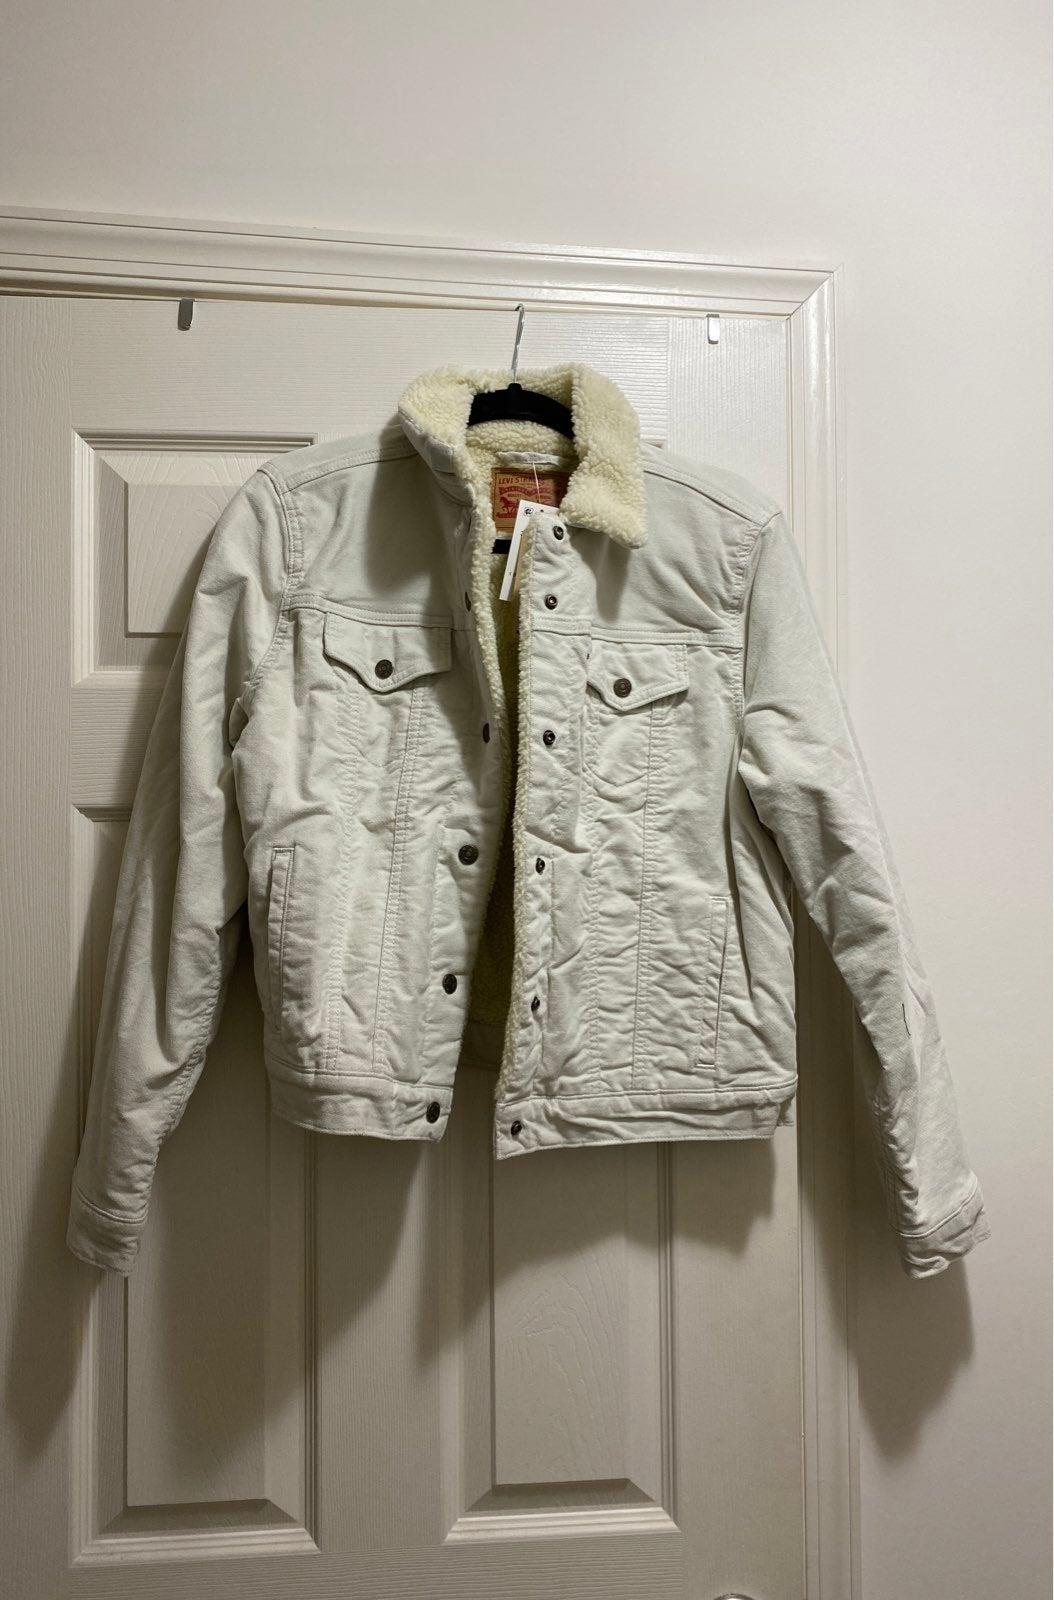 Levis Woman's Jacket